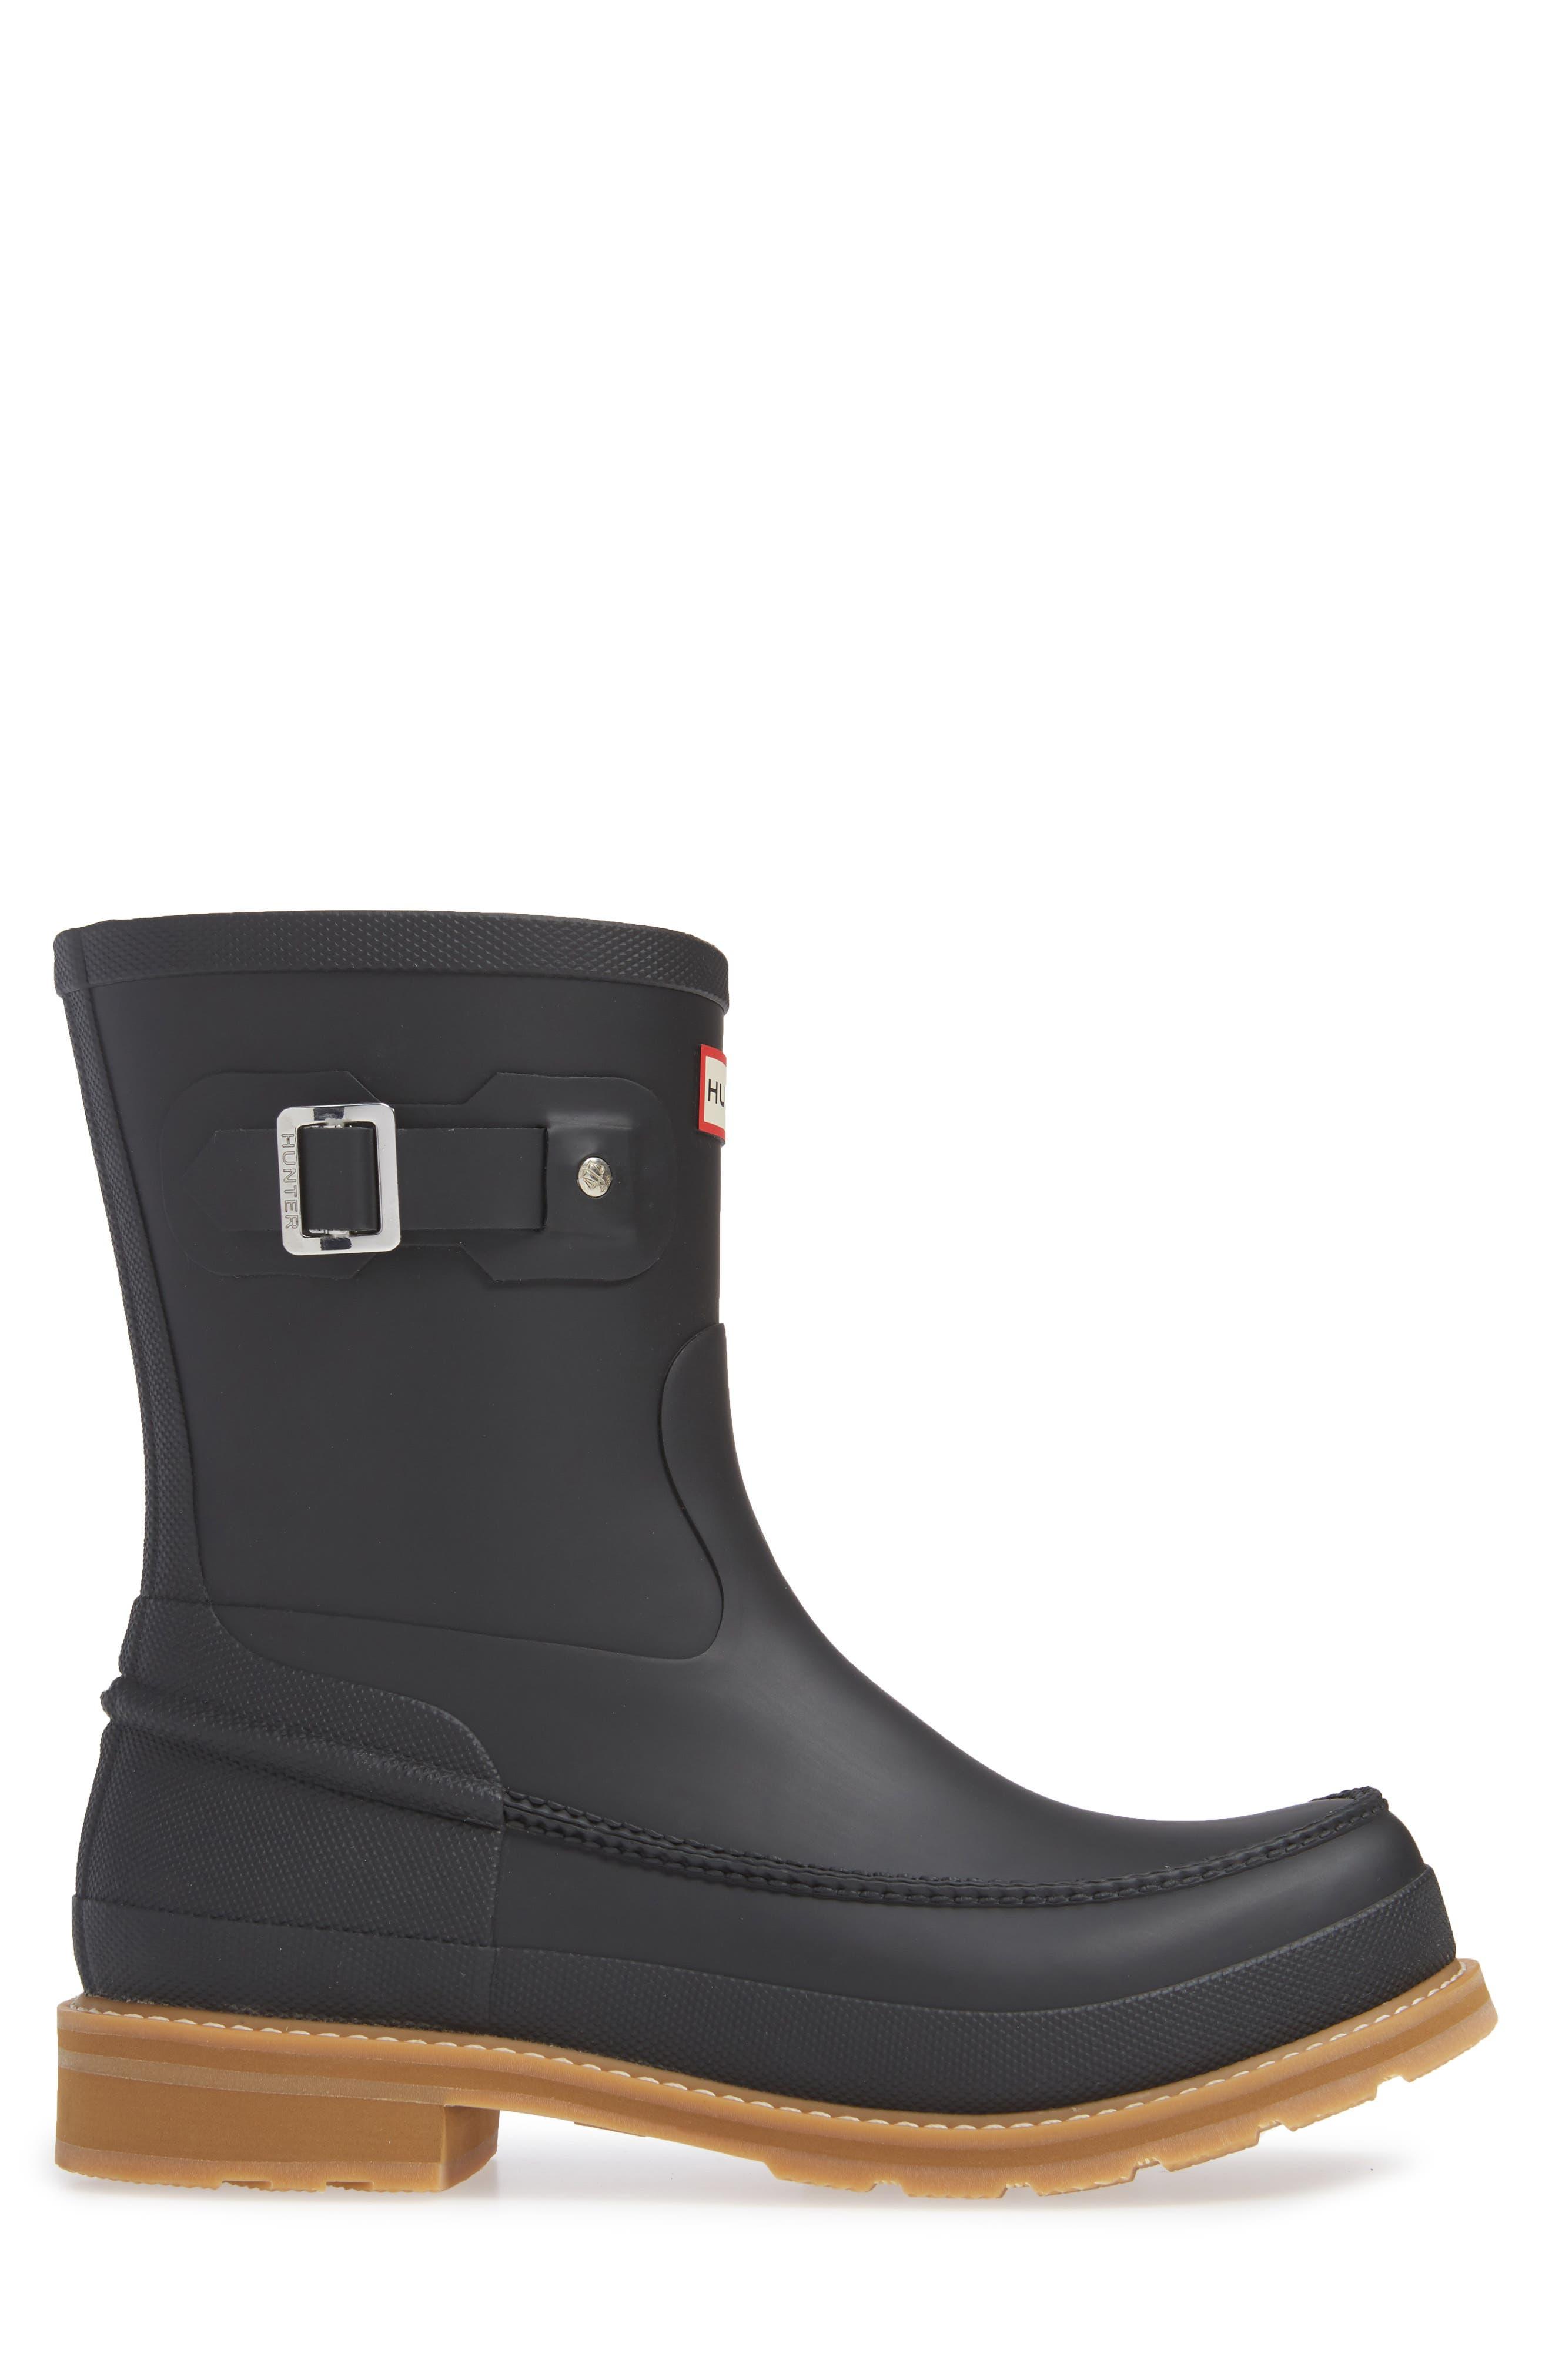 HUNTER, Waterproof Lightweight Short Boot, Alternate thumbnail 3, color, BLACK